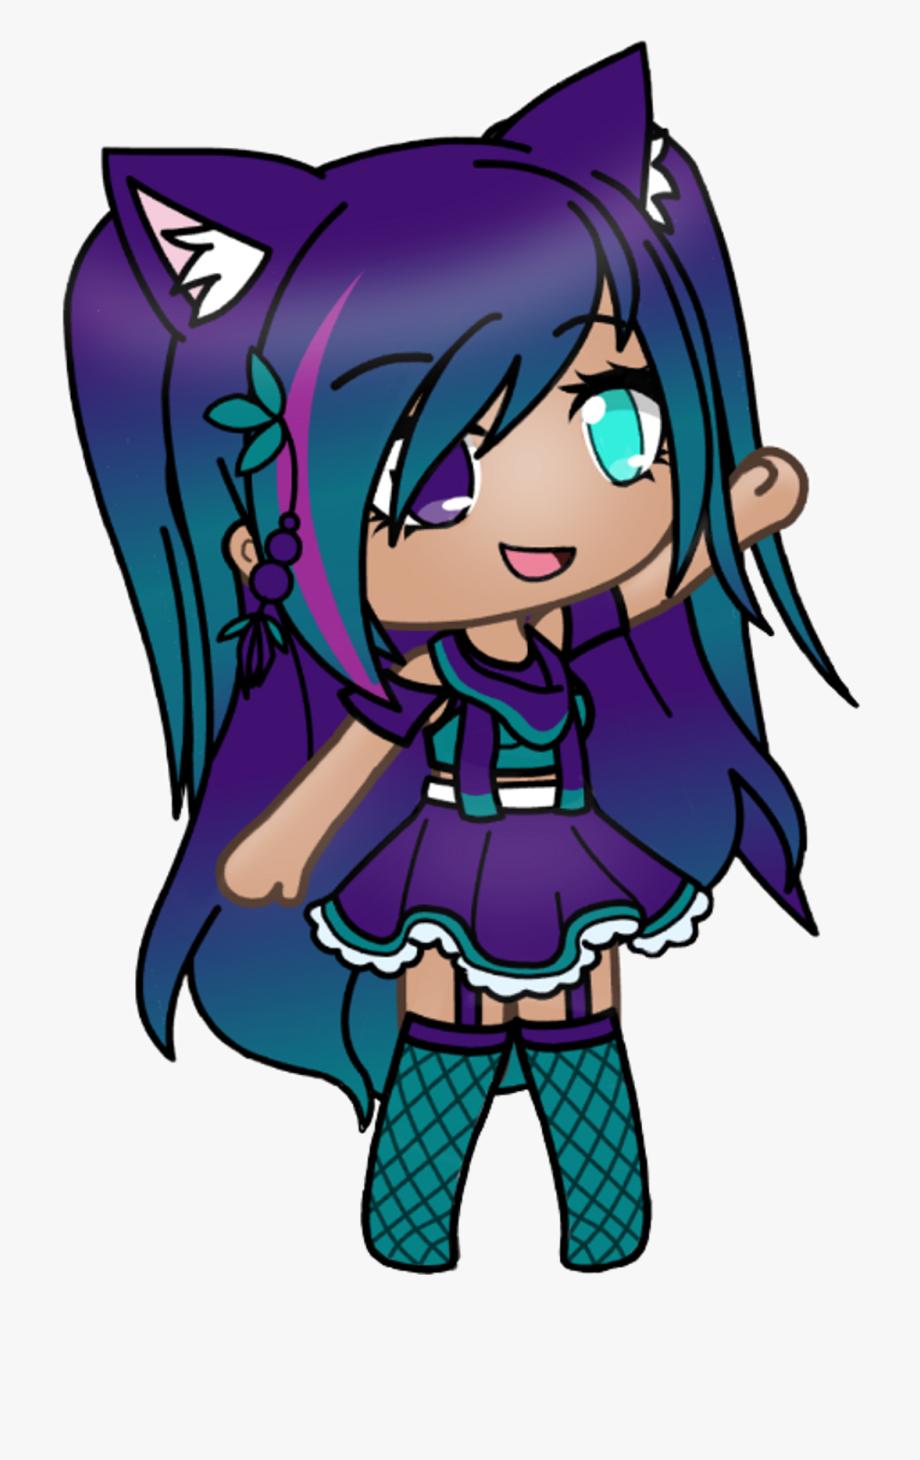 gacha gachalife gachaverse purple teal galaxy   Galaxy Girl 920x1460